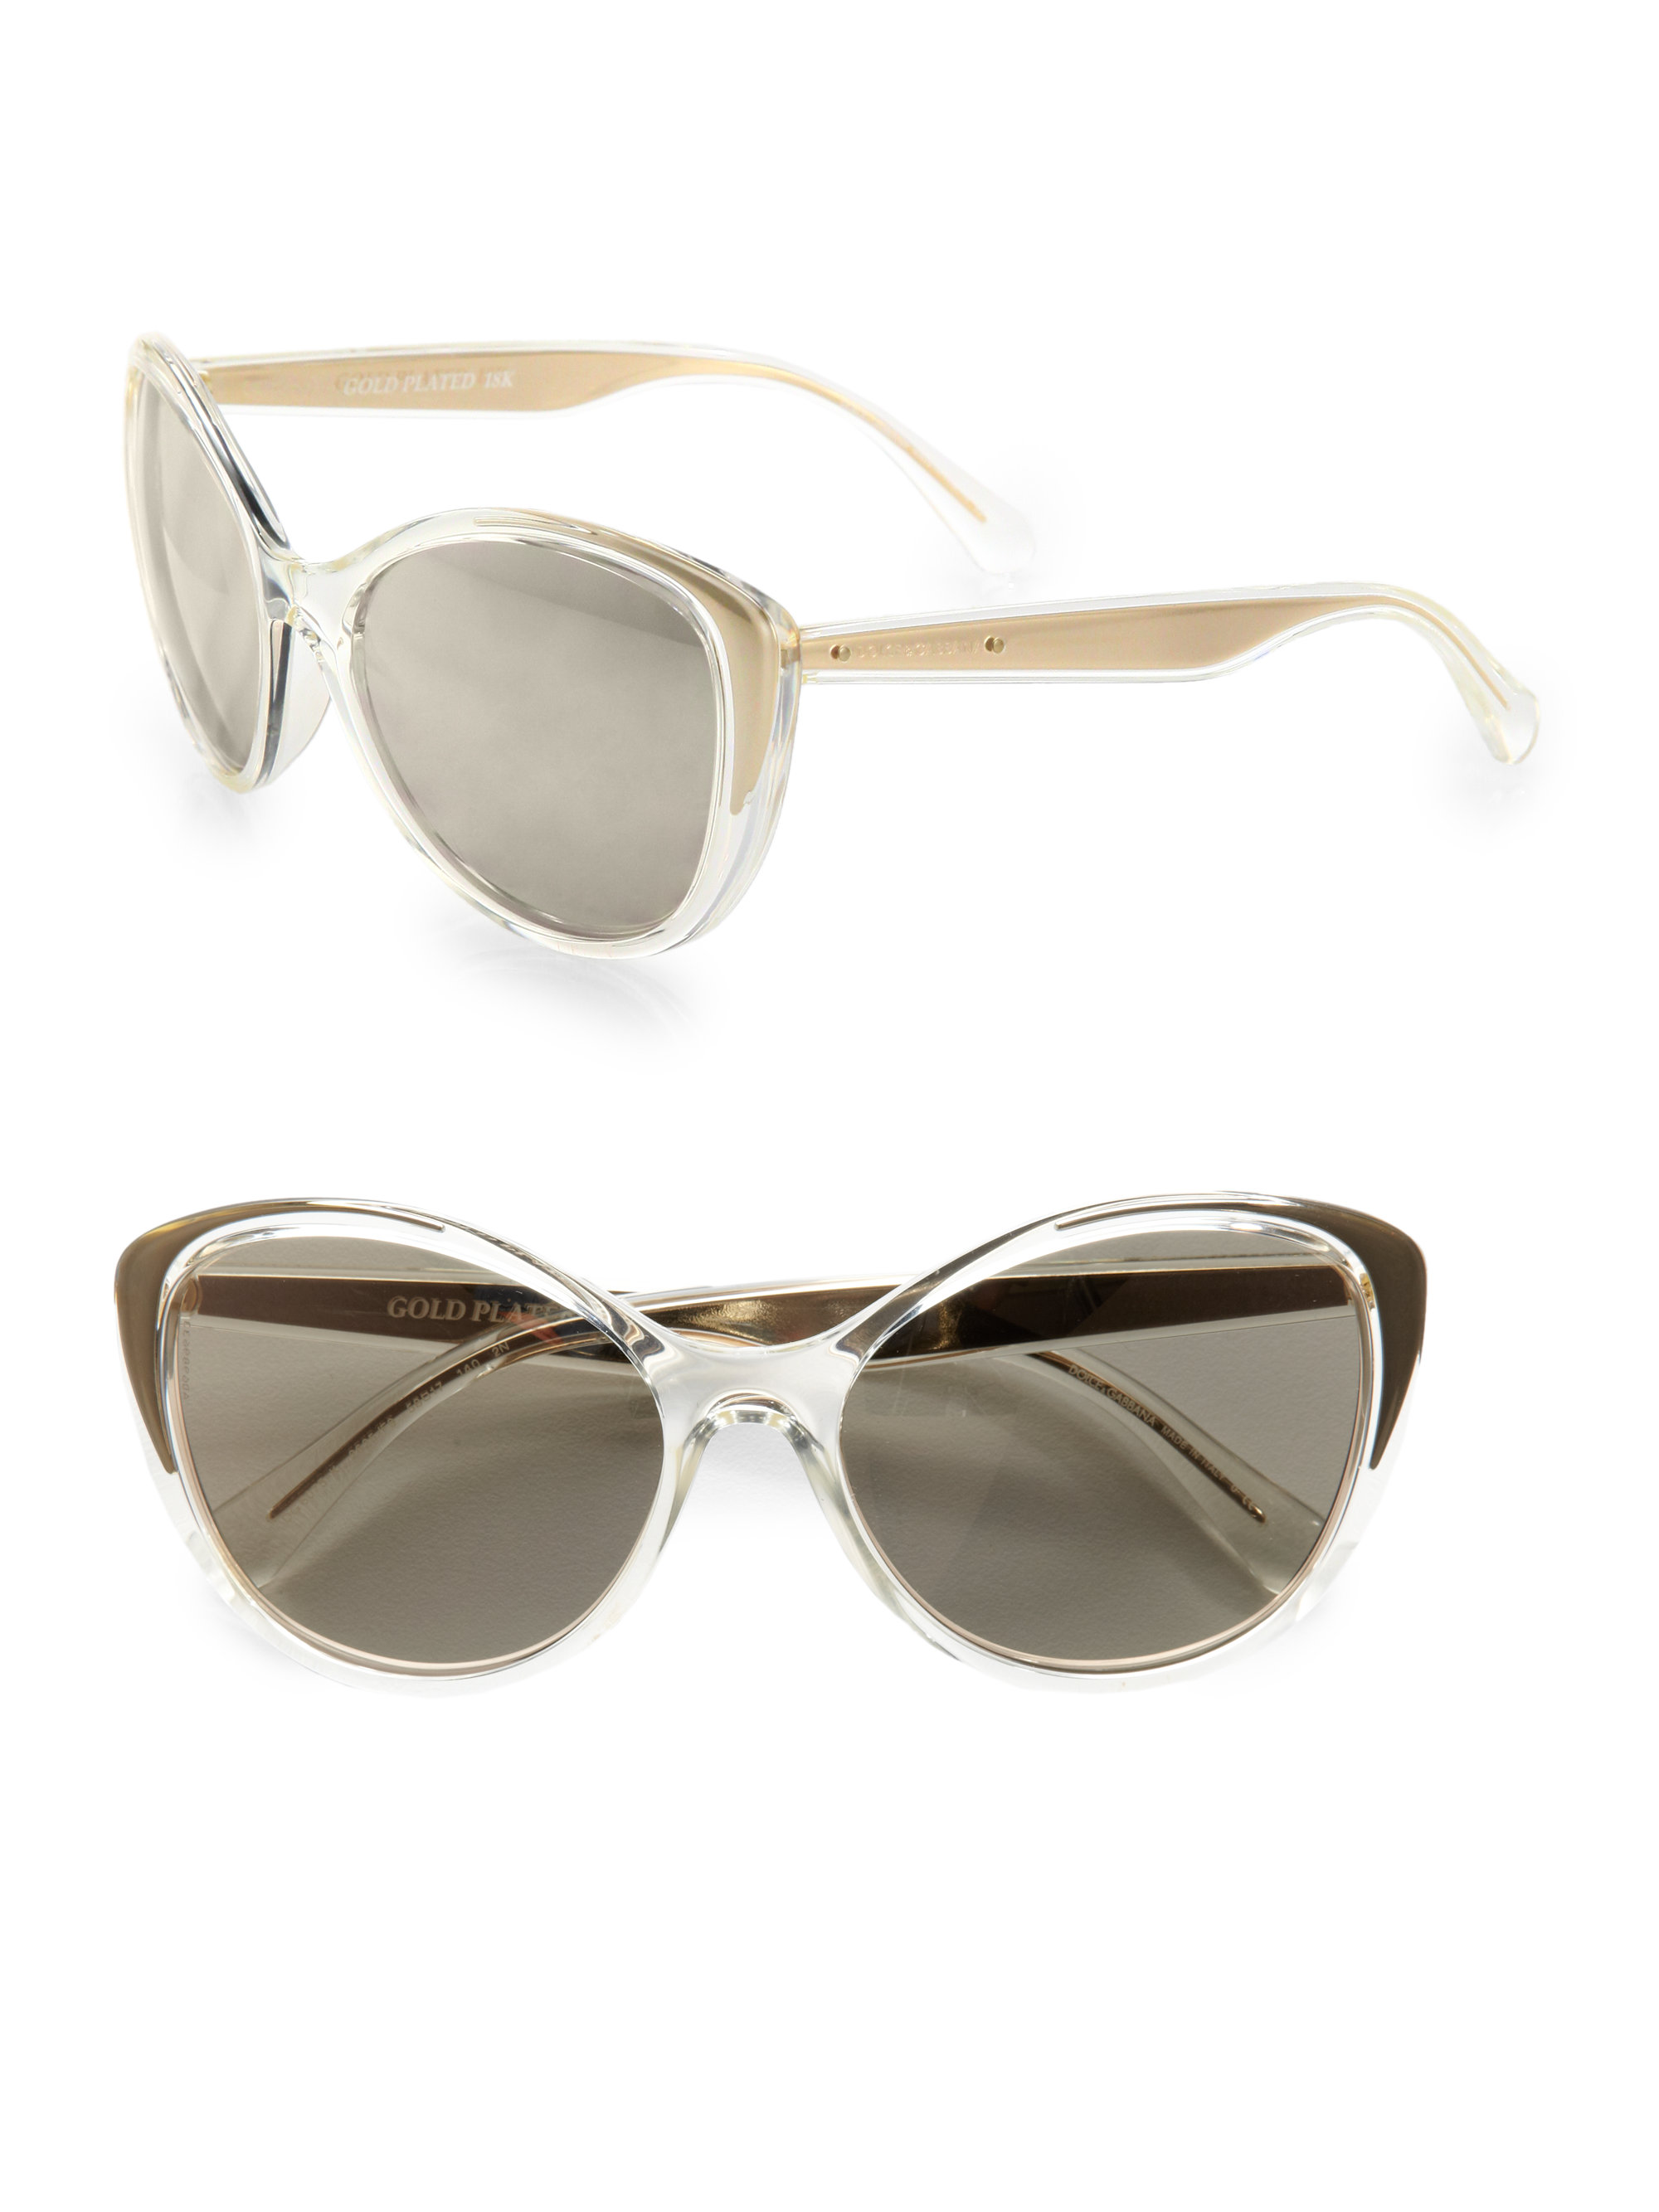 077a8b087ceb Lyst - Dolce   Gabbana 18k Goldplated Catseye Sunglasses in Metallic